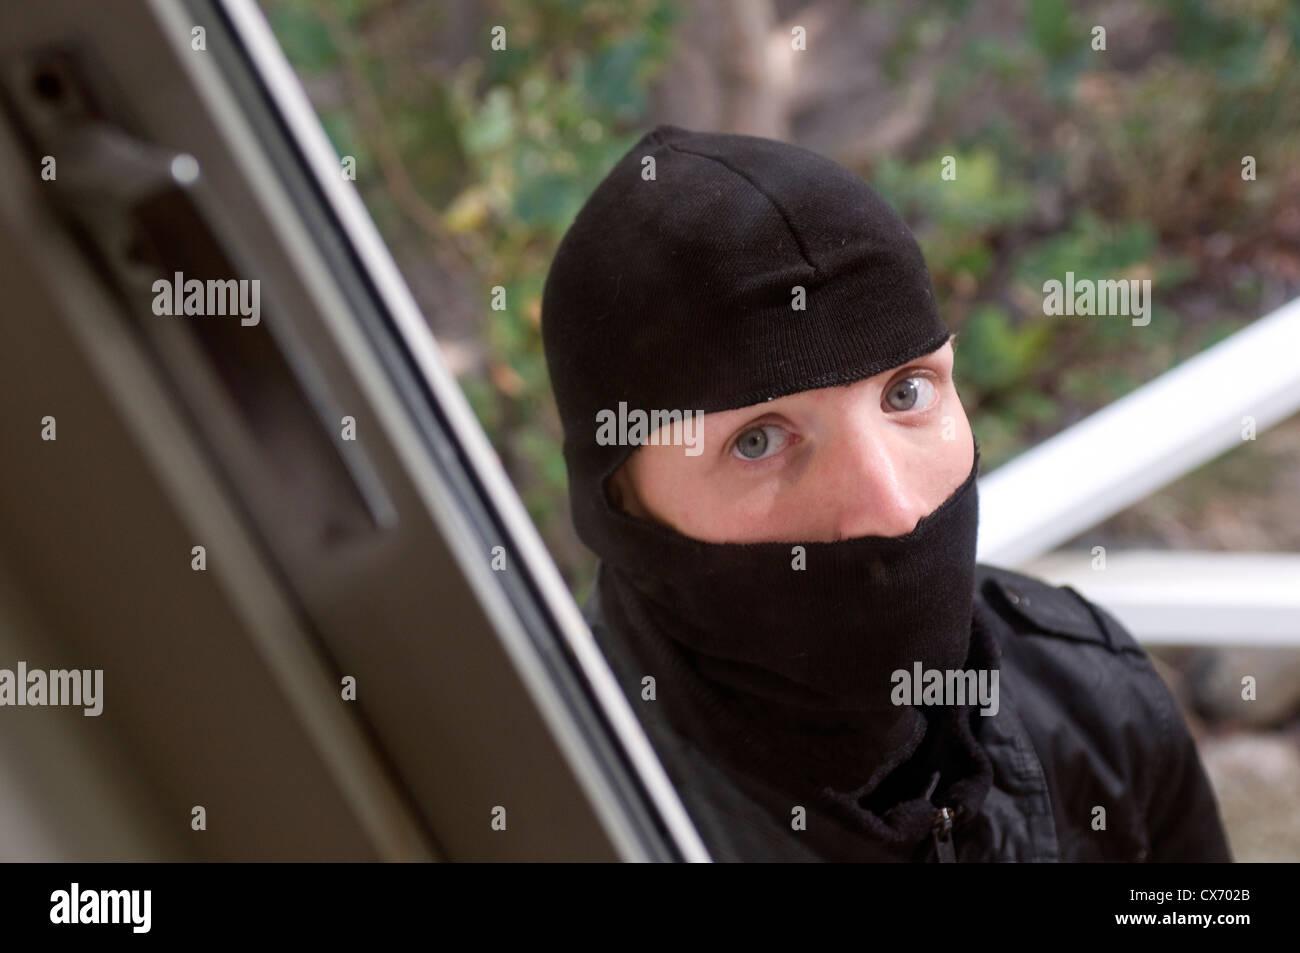 Burglar looking through house window - Stock Image